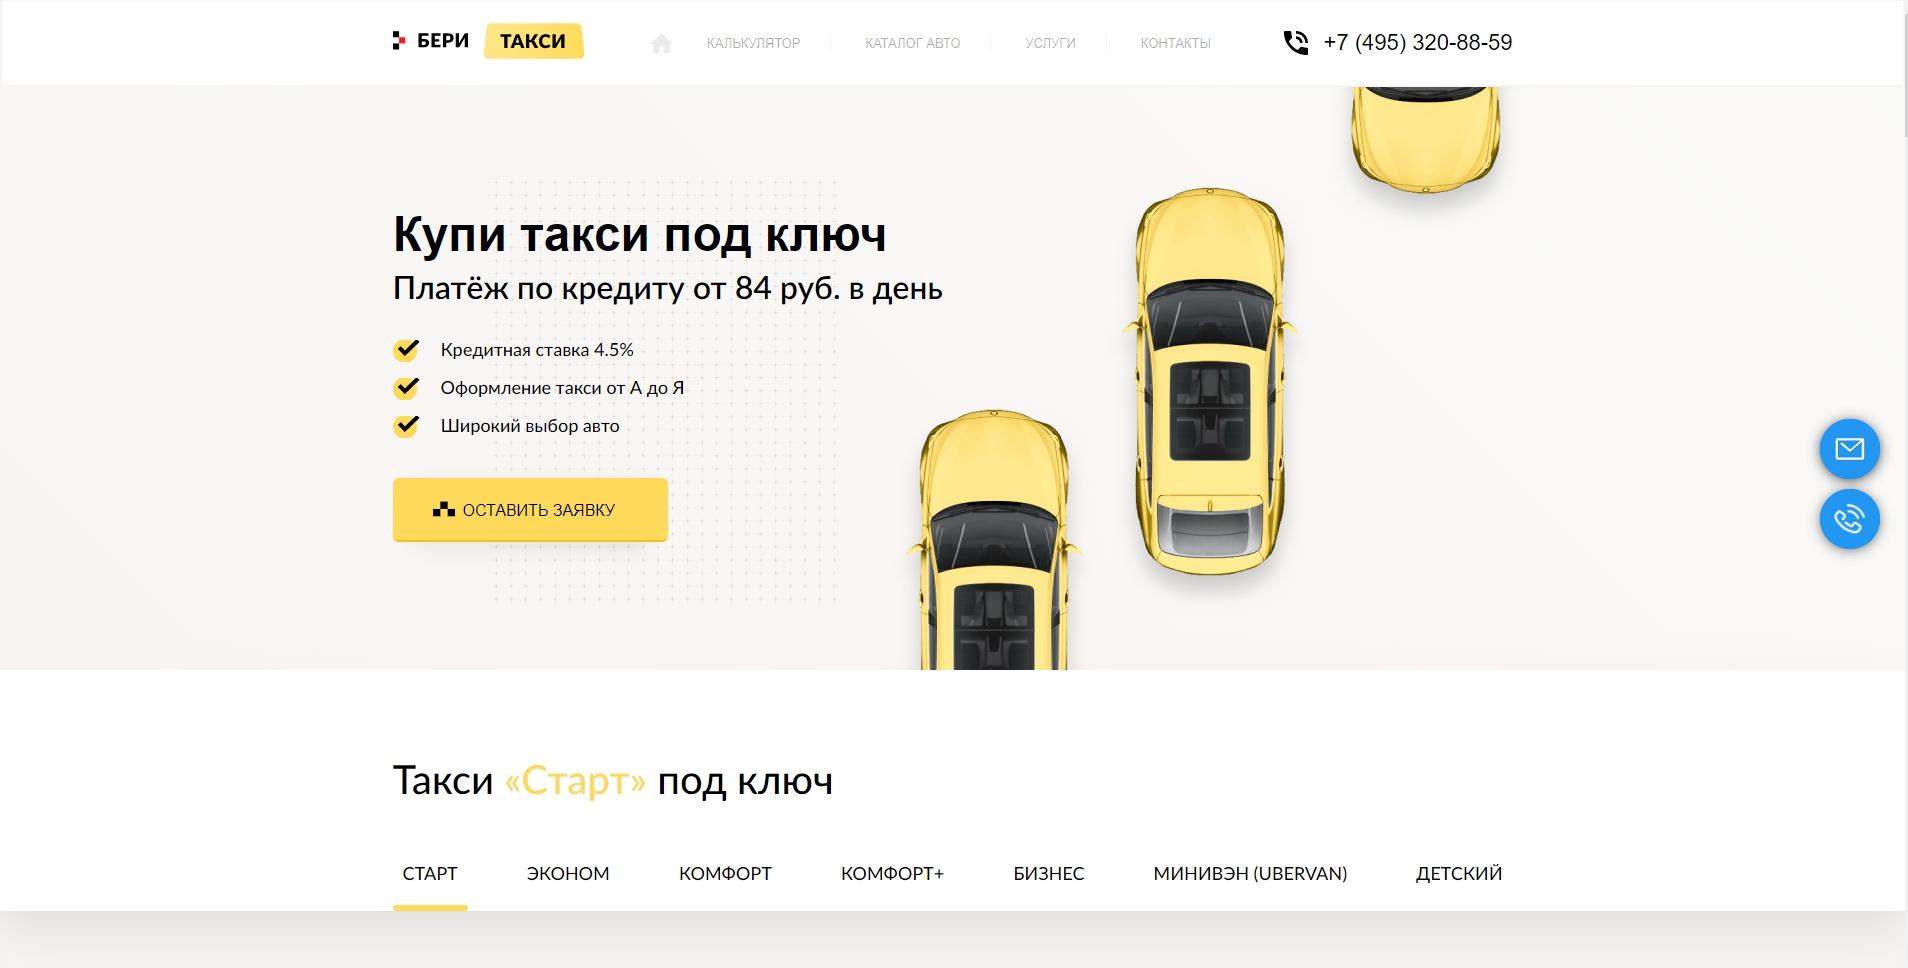 Бери Такси автосалон